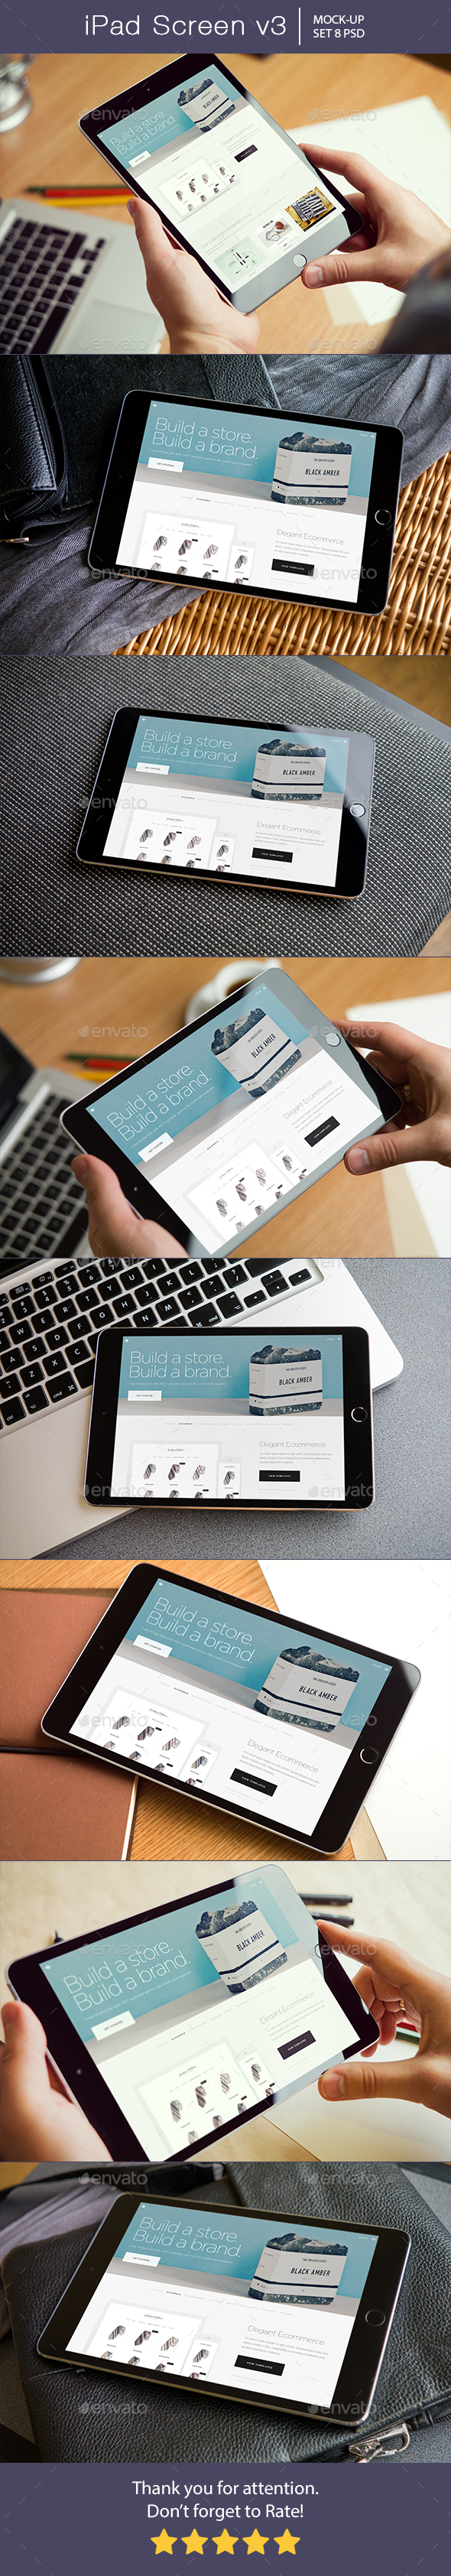 Pad Screen Mockup v3 - Mobile Displays